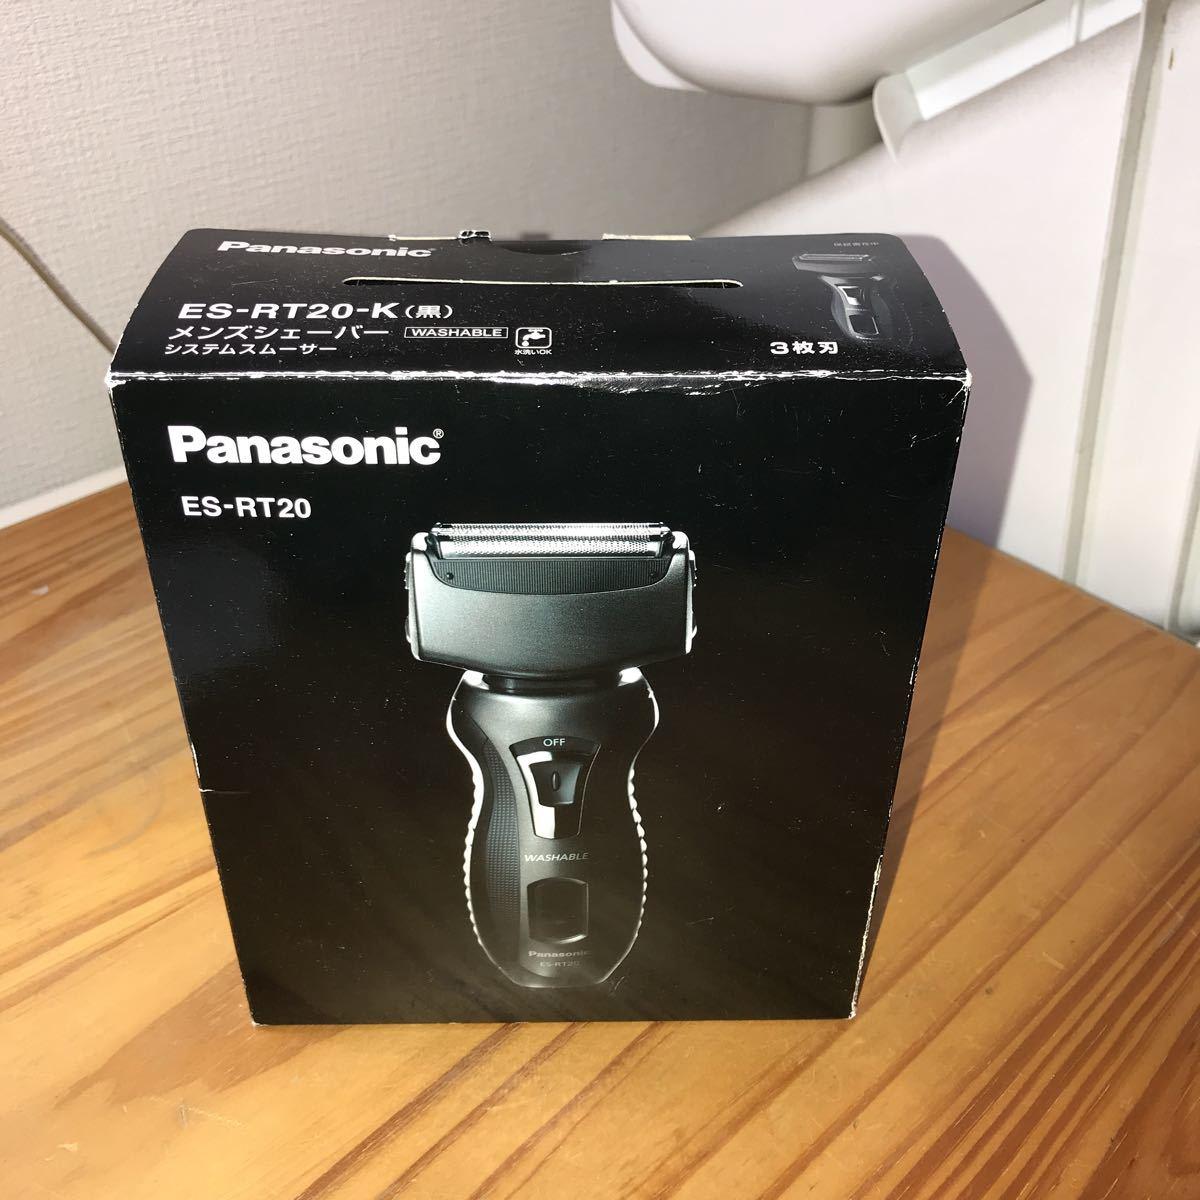 Panasonic システムスムーサー3枚刃 黒 ES-RT20-K 新品未使用未開封!_画像1